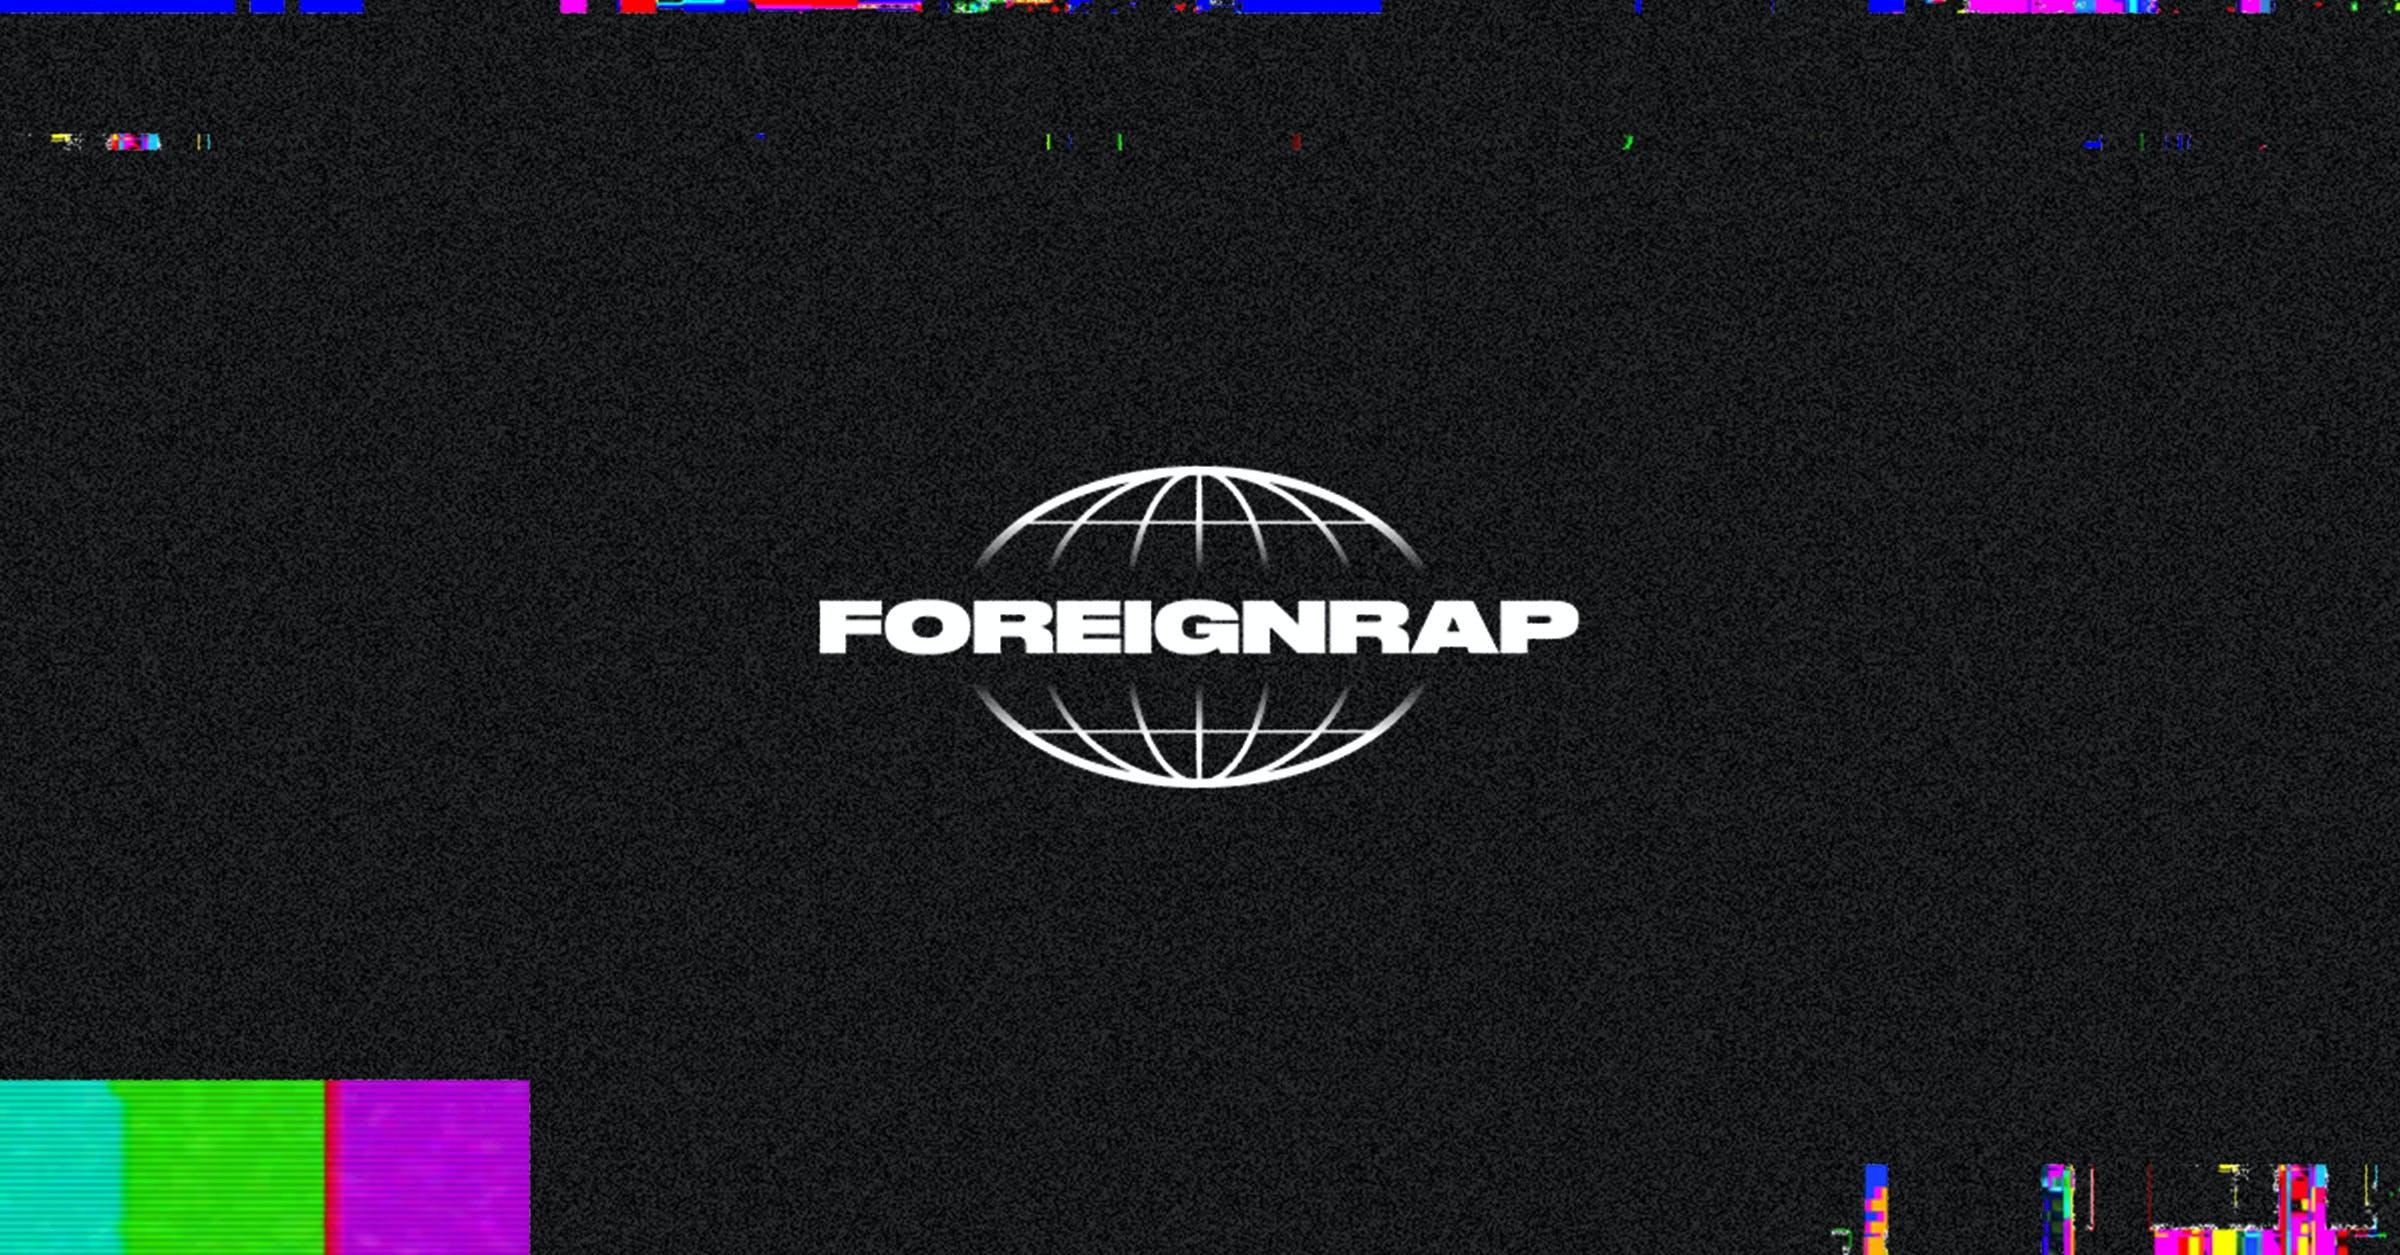 Foreignrap Thumbnail